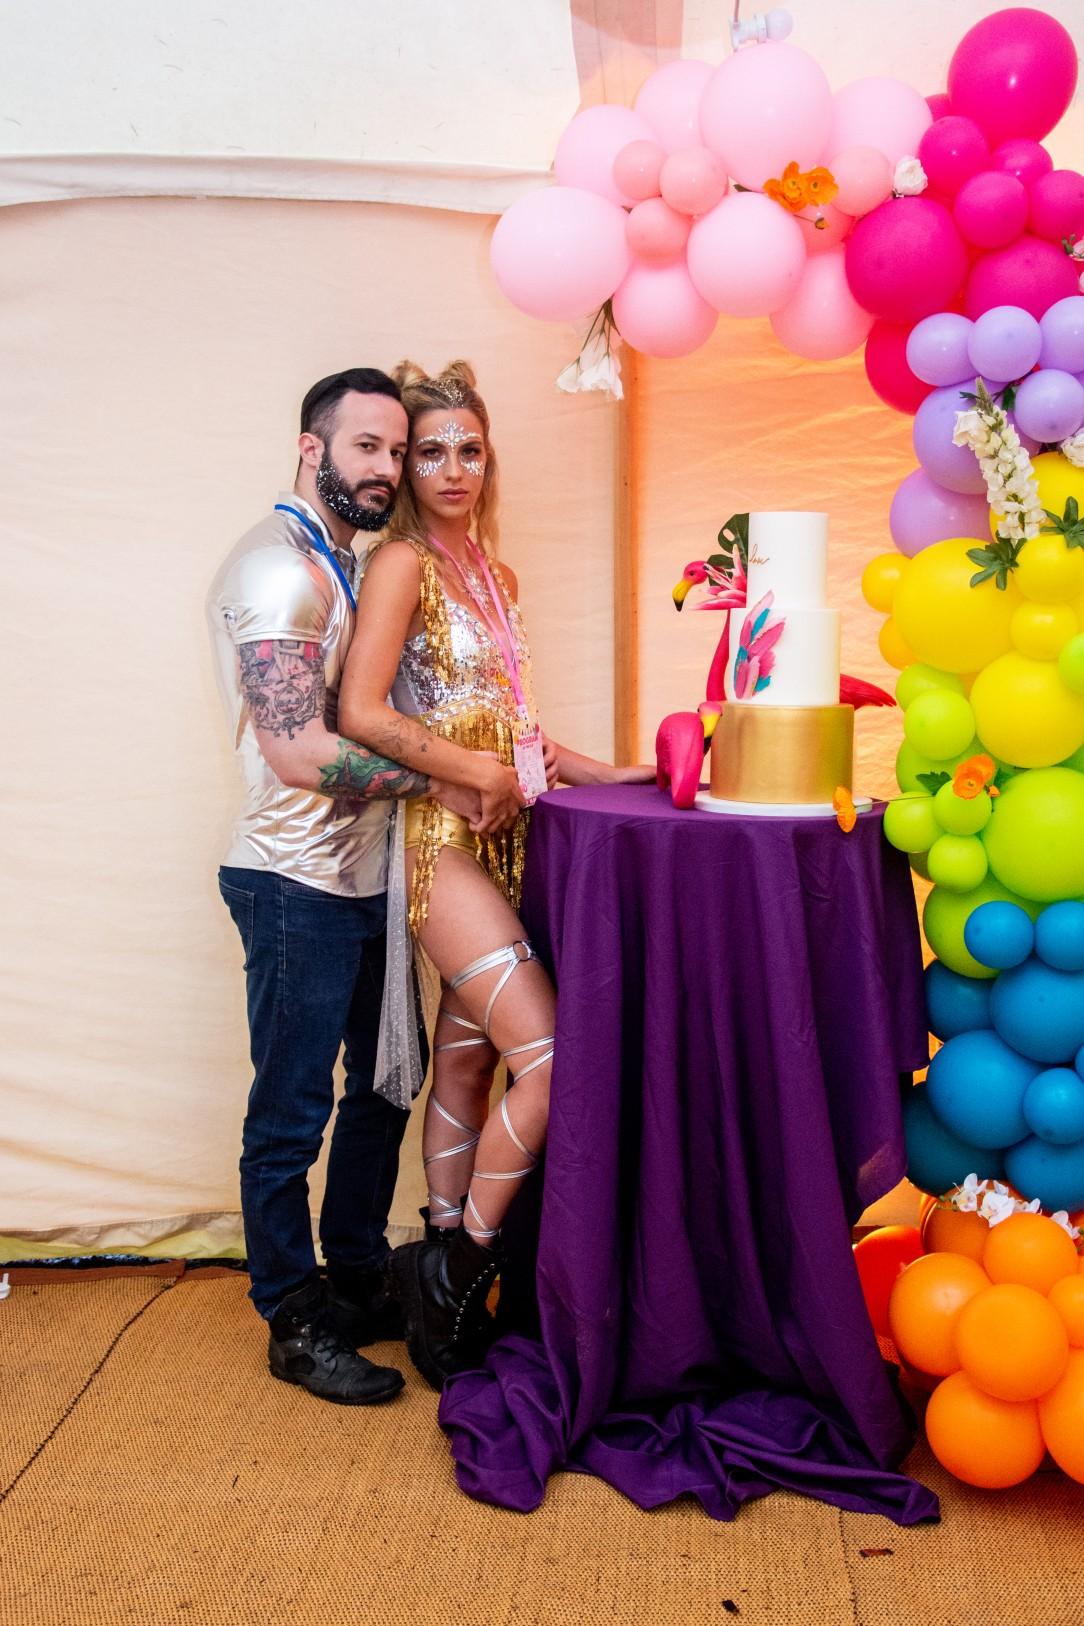 sparkly festival wedding - rainbow wedding balloons - colourful wedding balloons - festival wedding wear - unique wedding cake